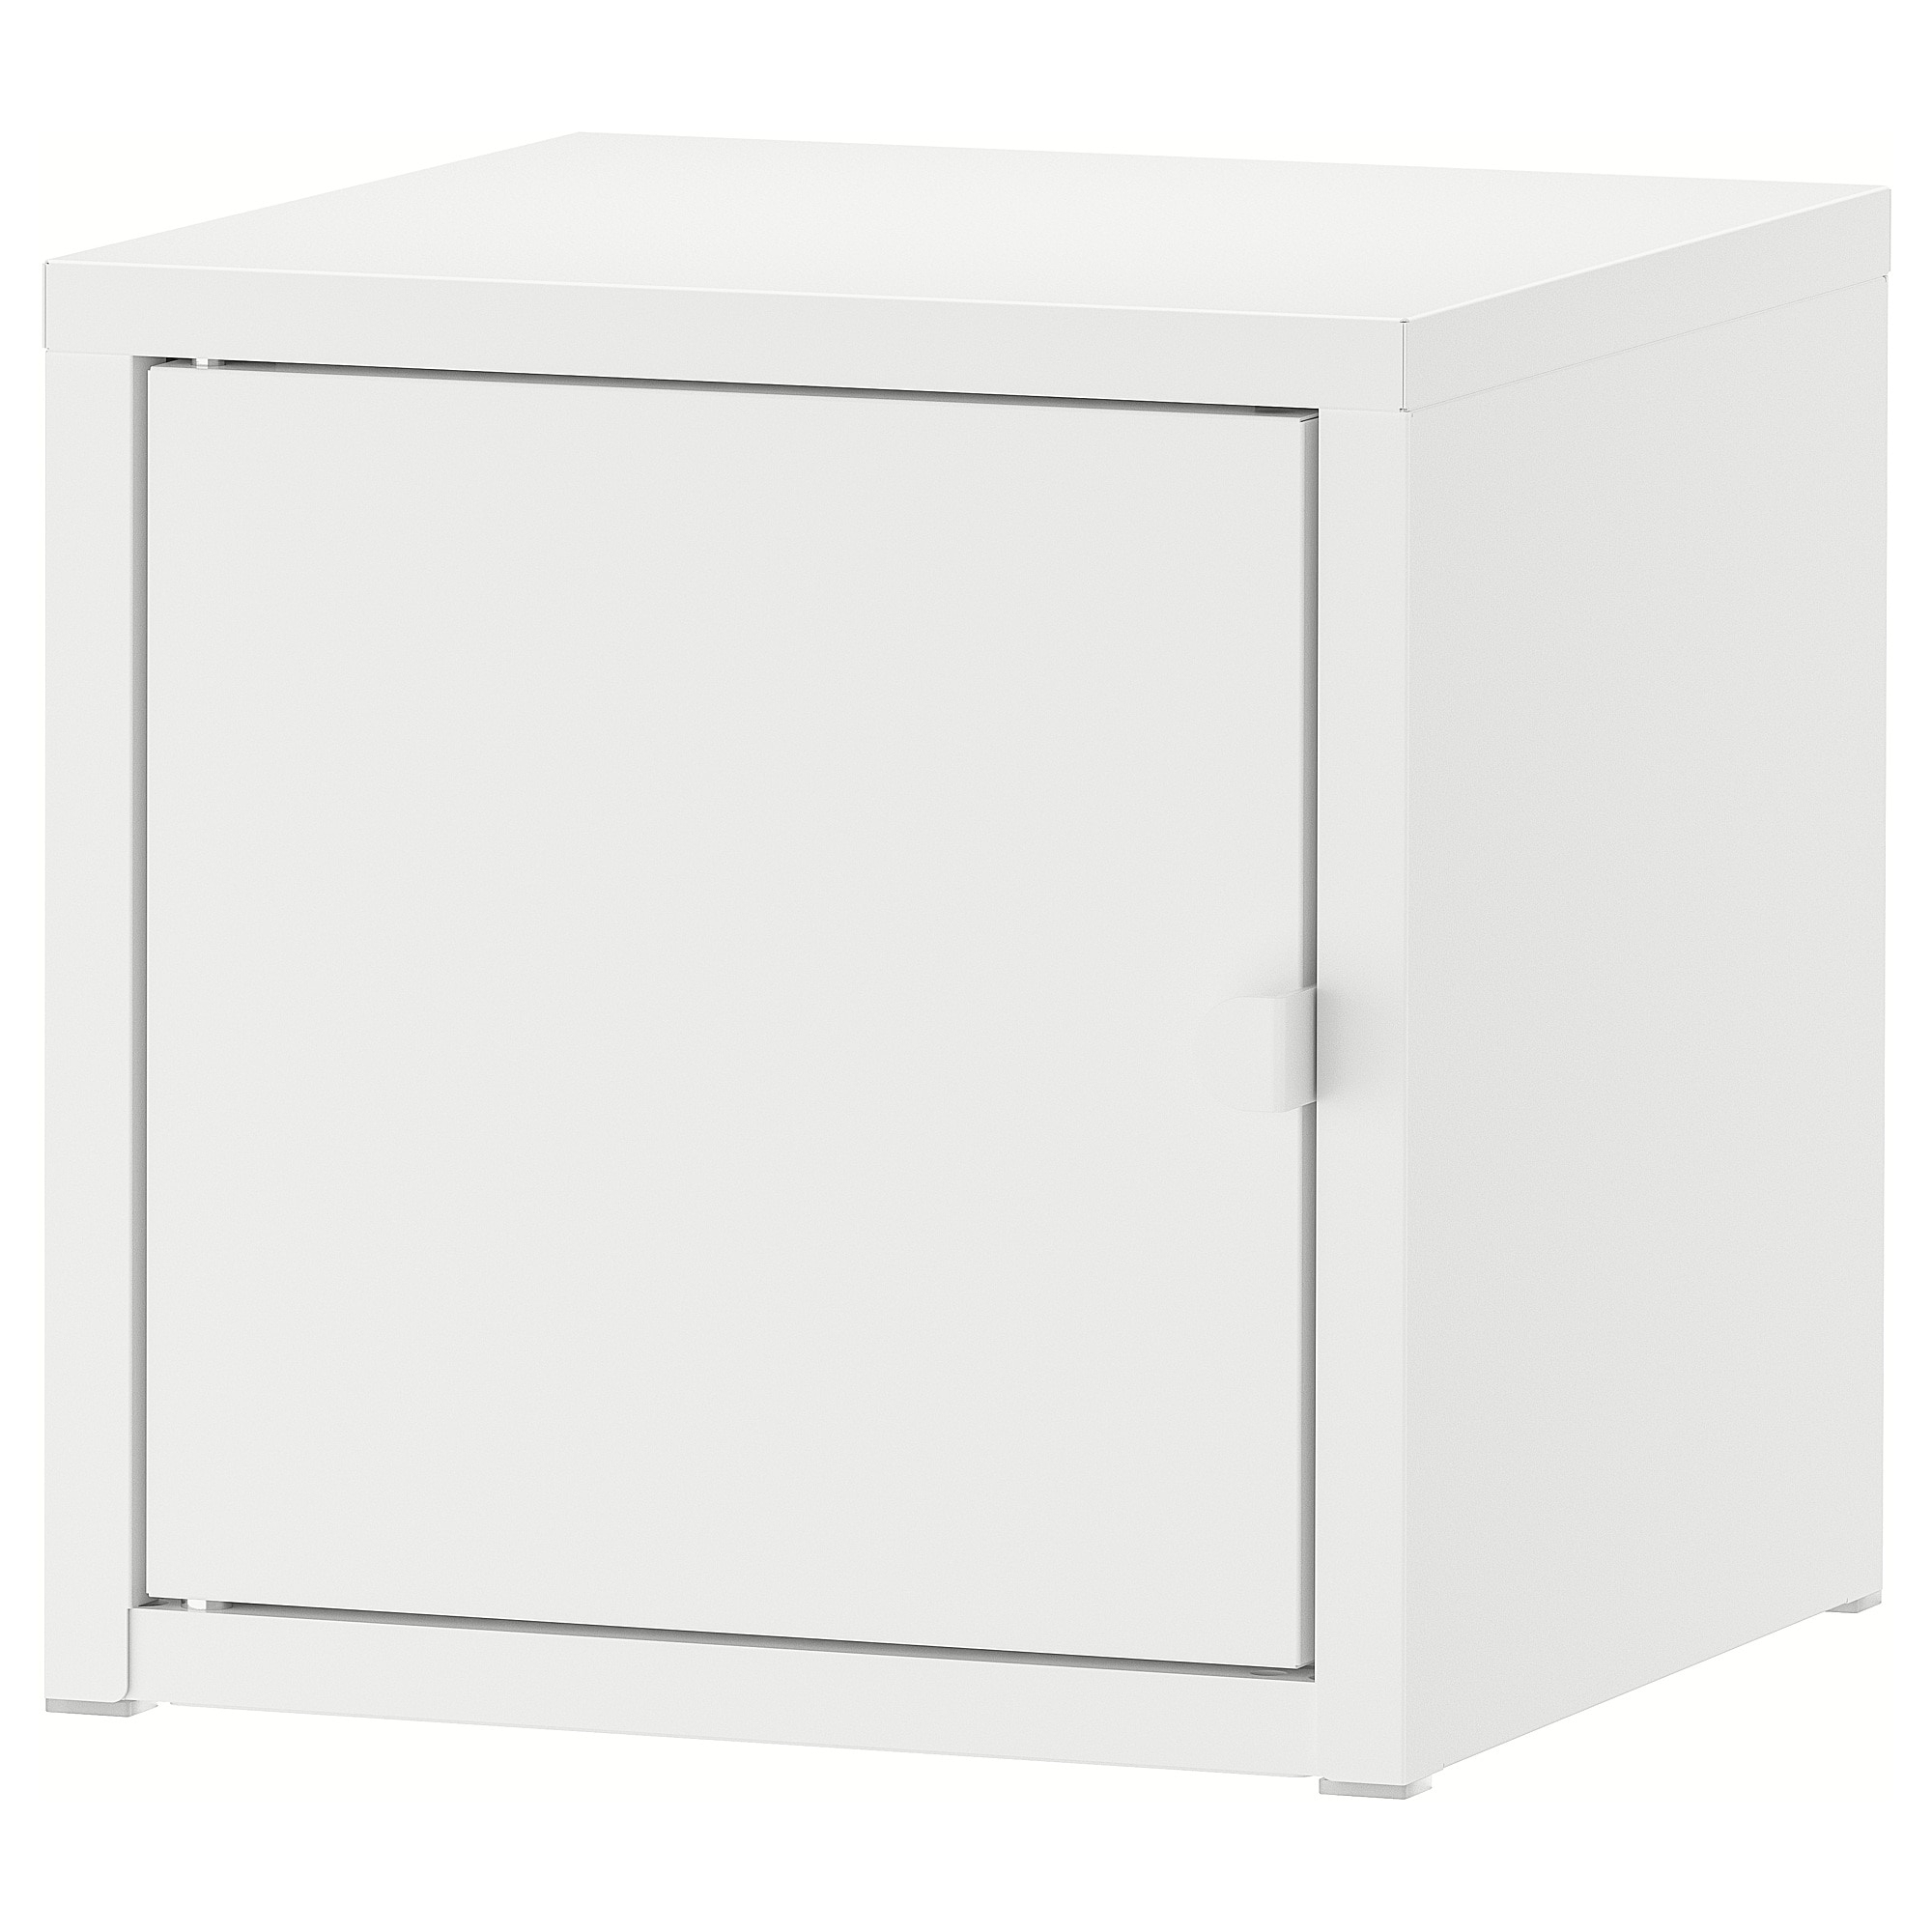 Storage Cabinets & Storage Cupboards | Ikea Ireland within Mid Burnt Oak 71 Inch Sideboards (Image 25 of 30)